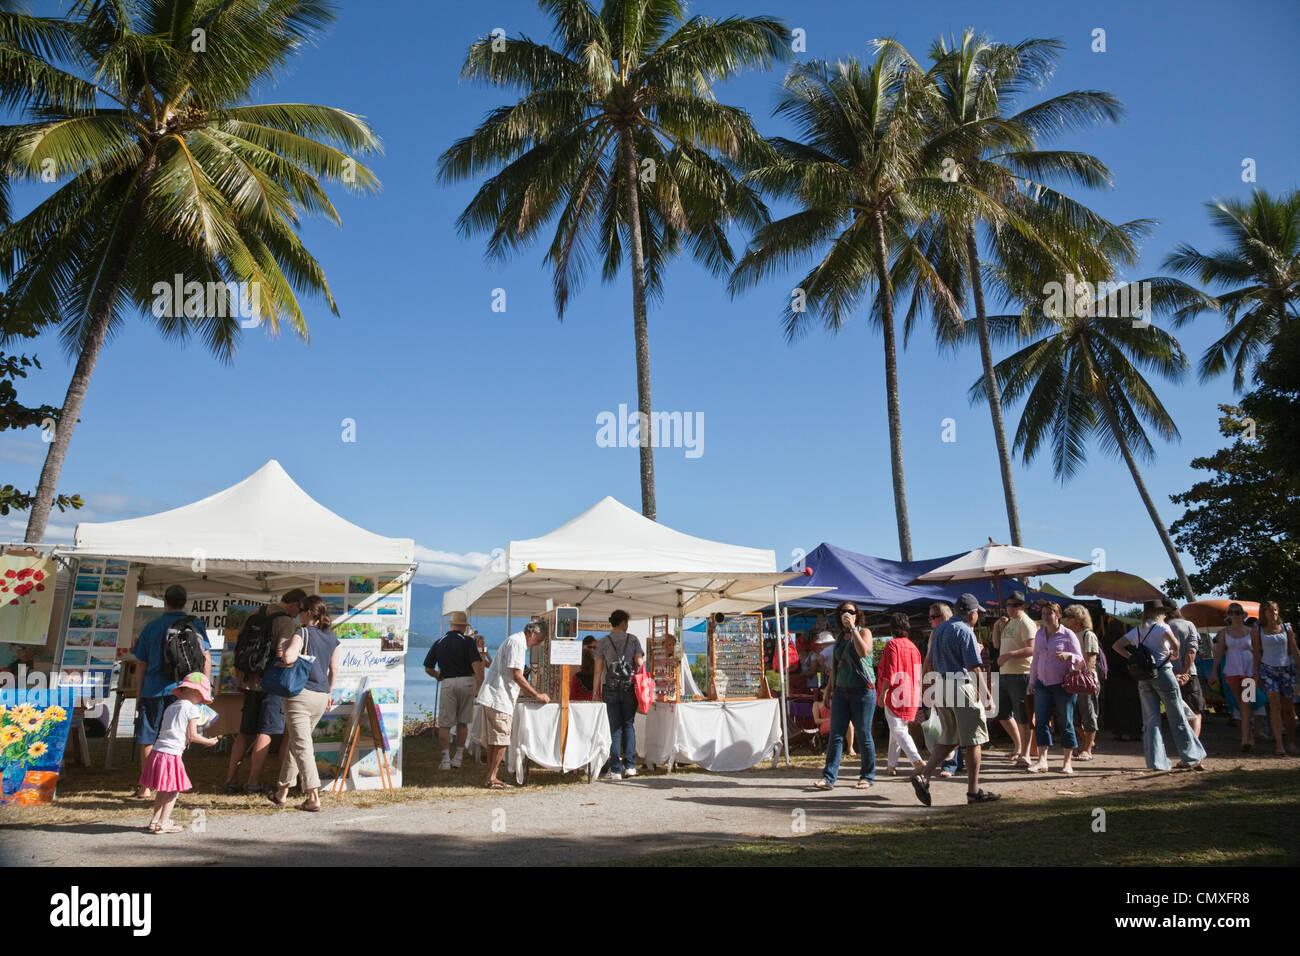 Sunday Markets at Port Douglas, Queensland, Australia - Stock Image